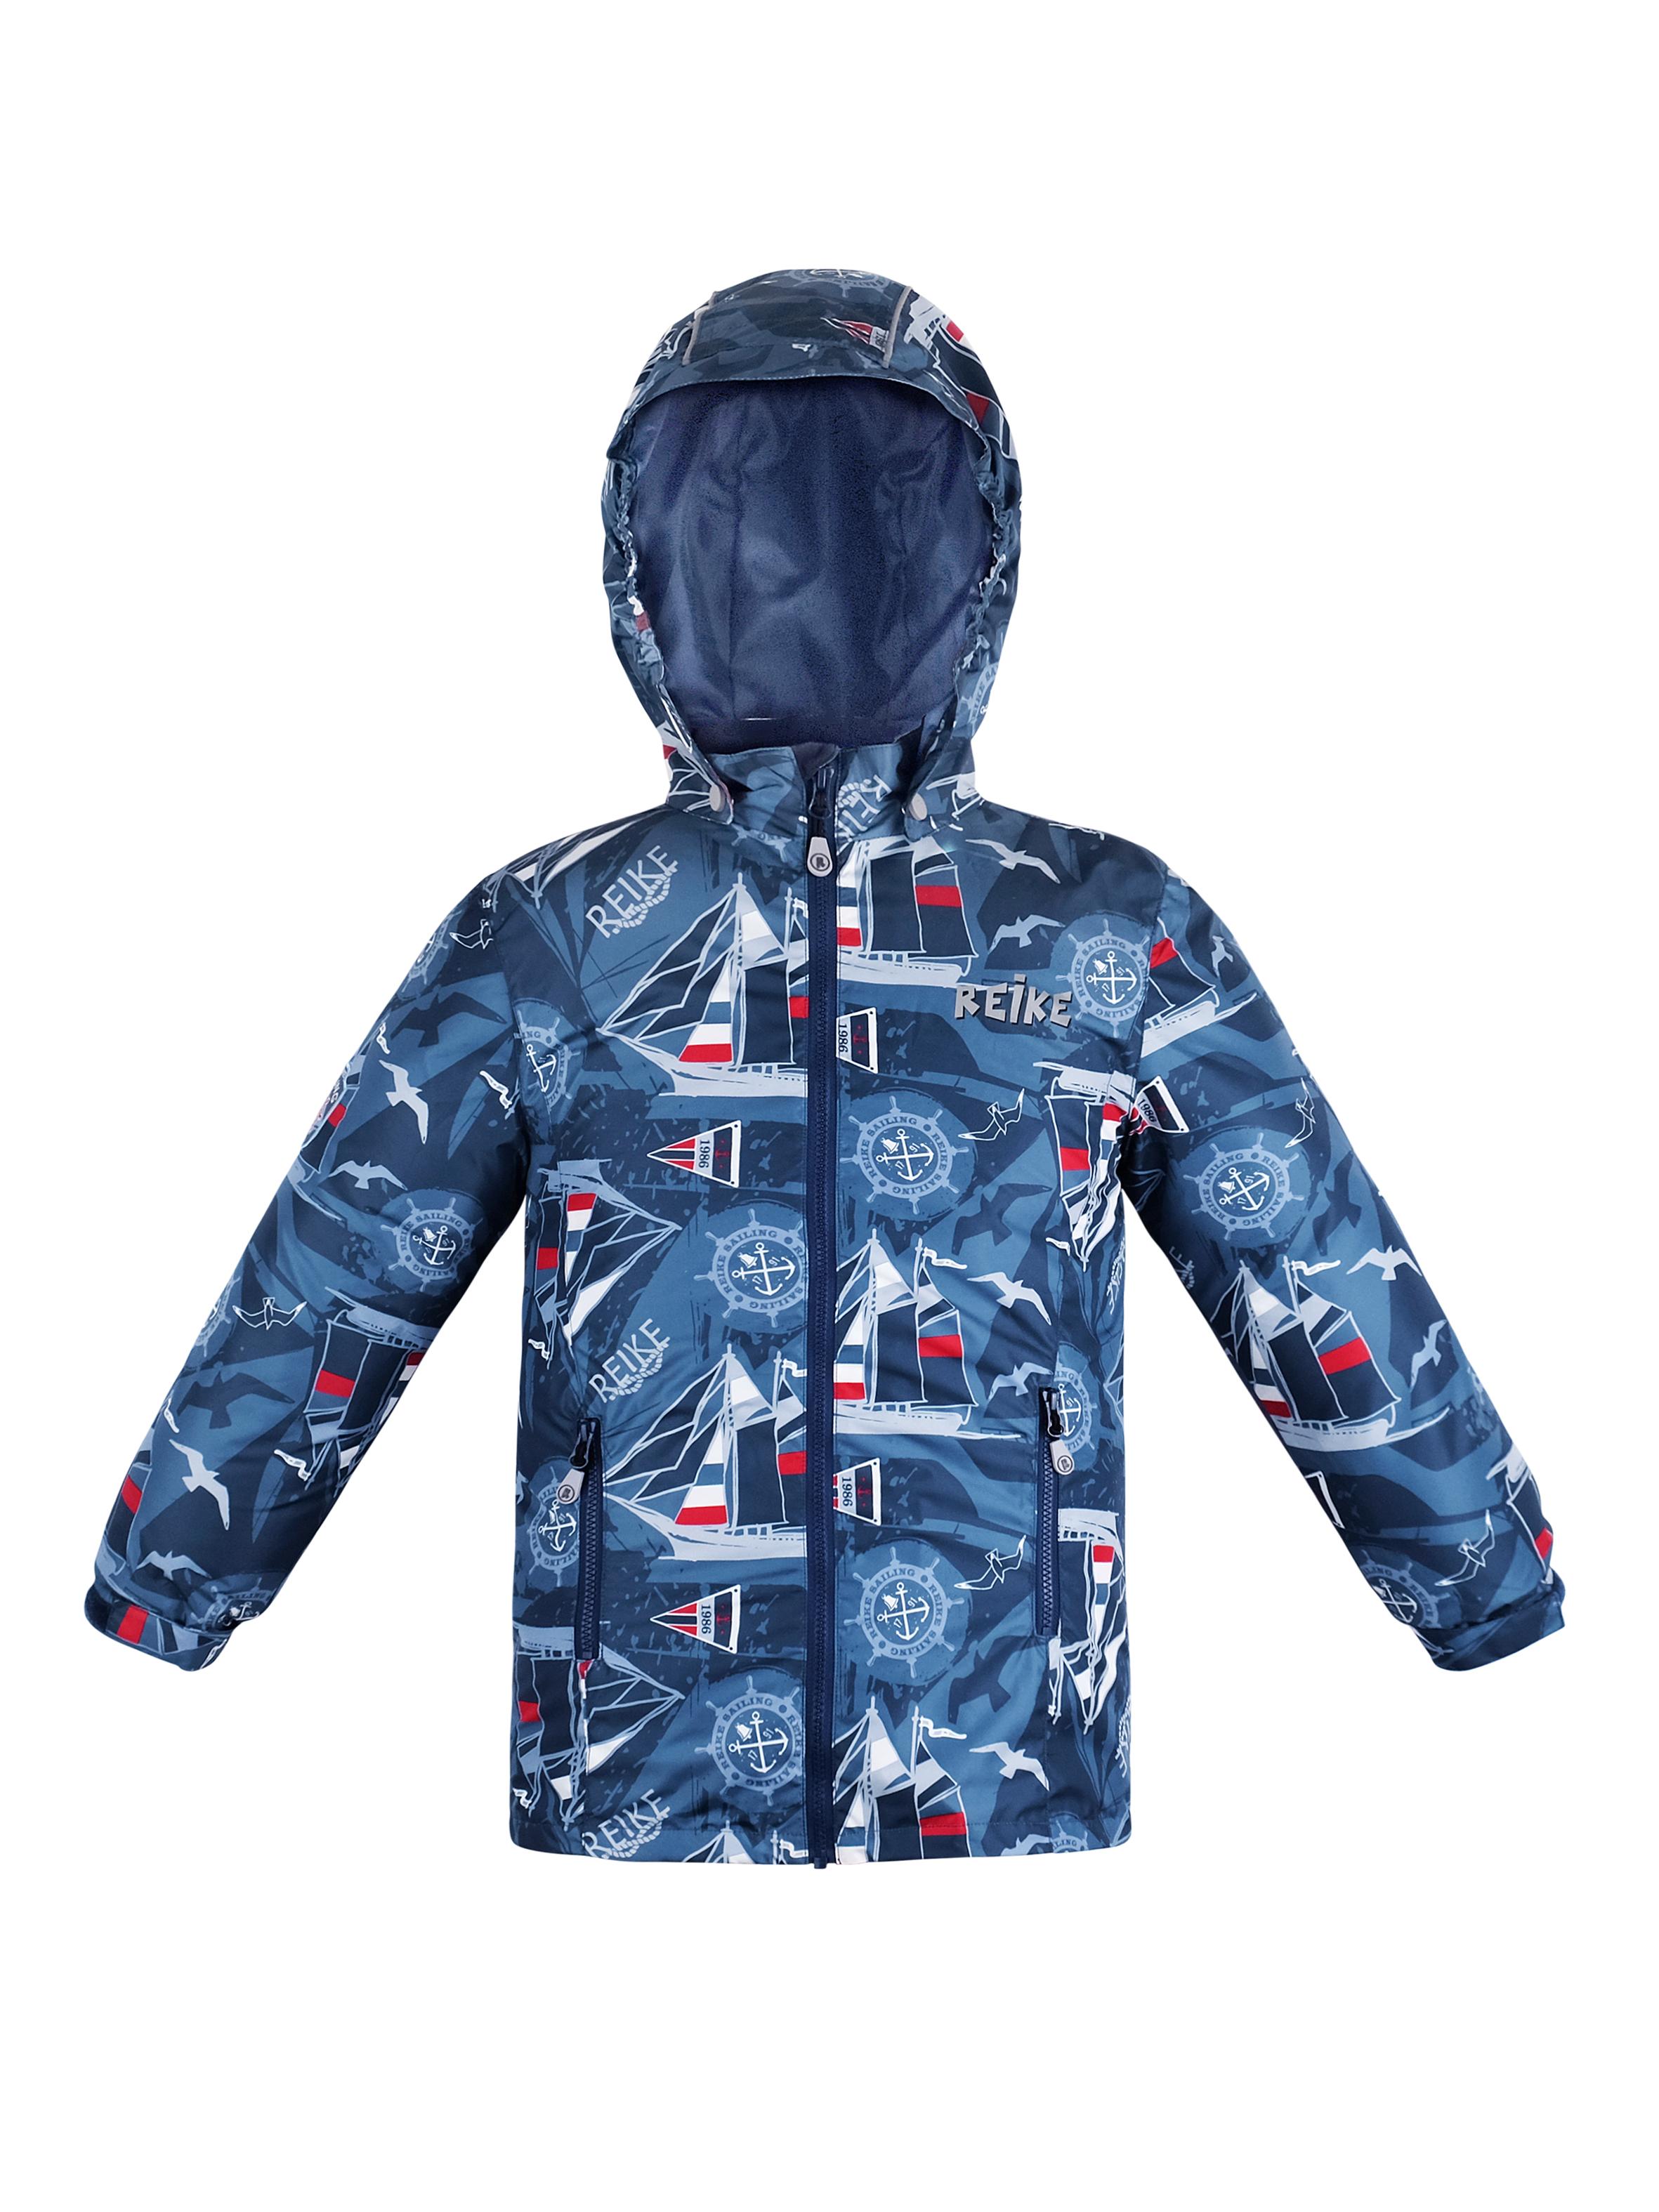 Куртка для мальчика Reike Sailing blue р.146